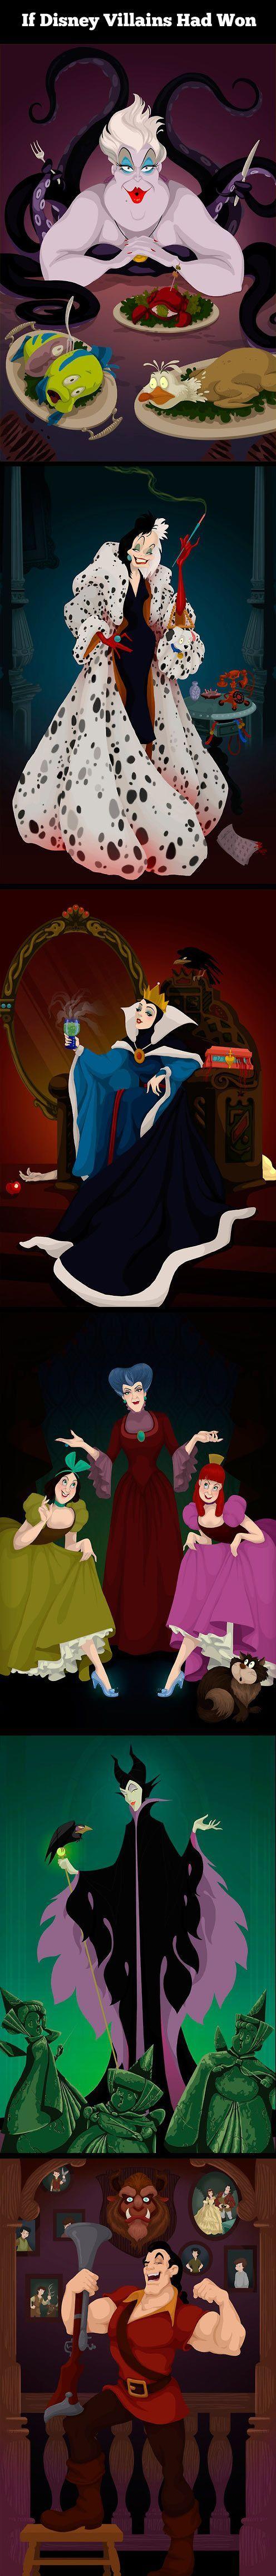 If the Disney Villains had won...I love how Gaston's has their 6 of 7 boys on the back wall.